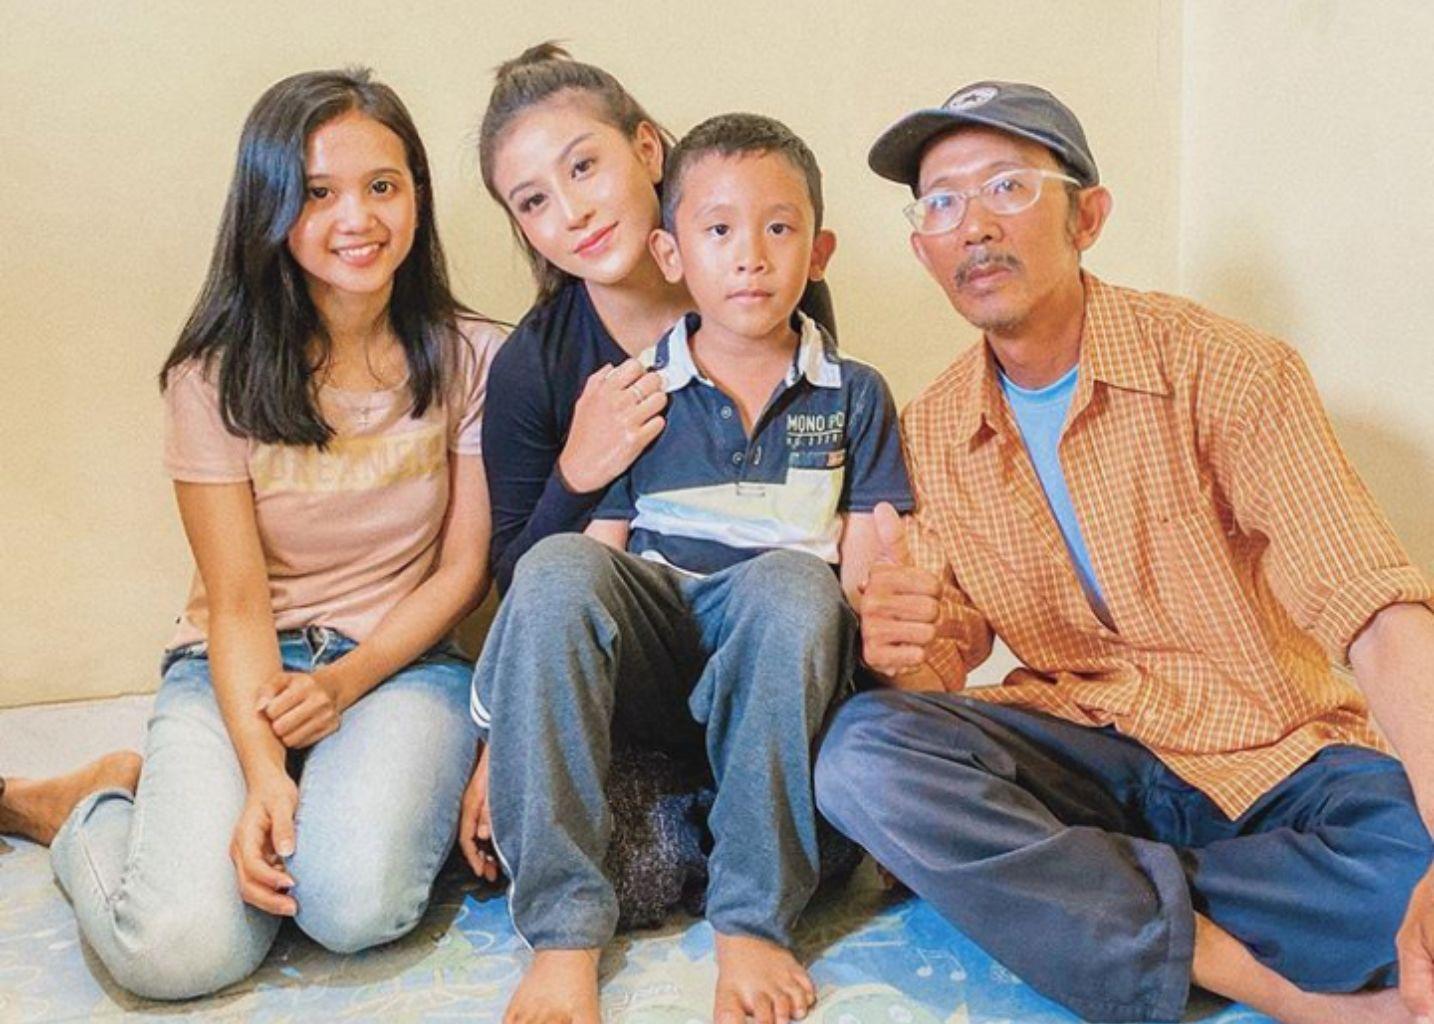 Awkarin, Si Influencer dengan Jiwa Sosial Tinggi